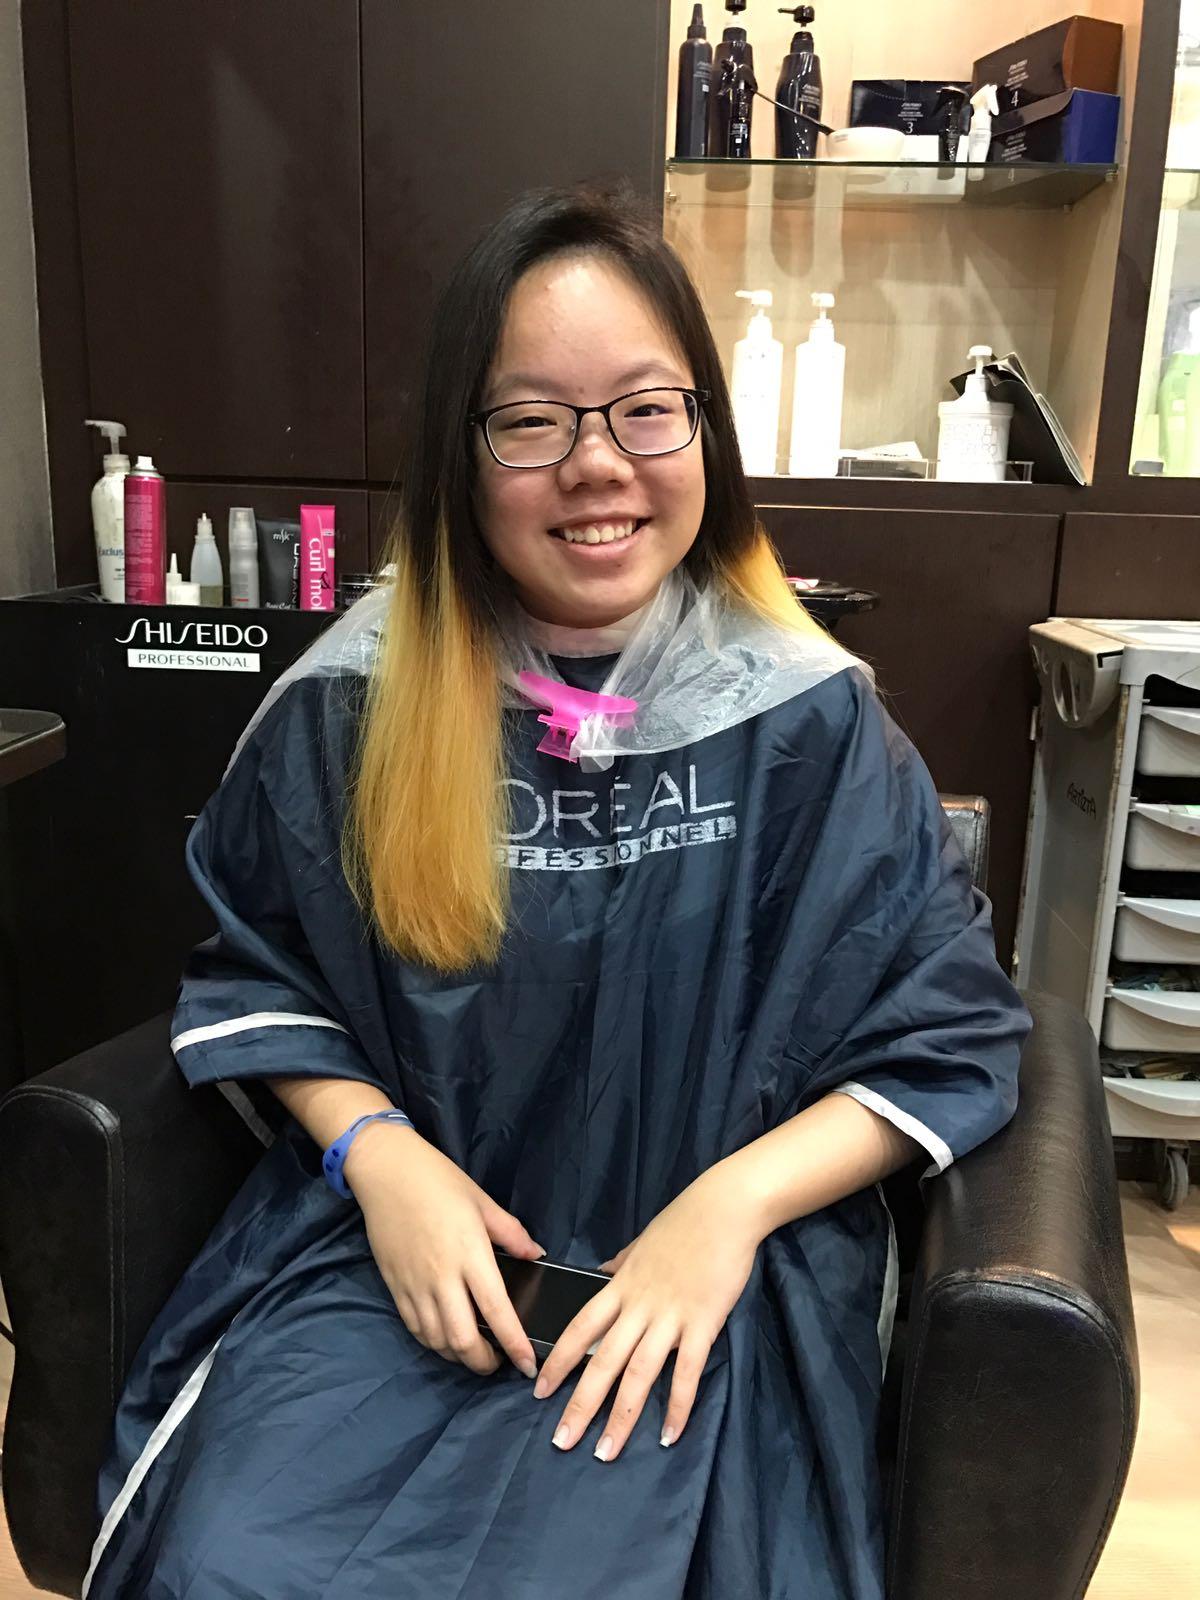 Hair Dye 2 Zest Hair Salon Holiday Plaza Jb